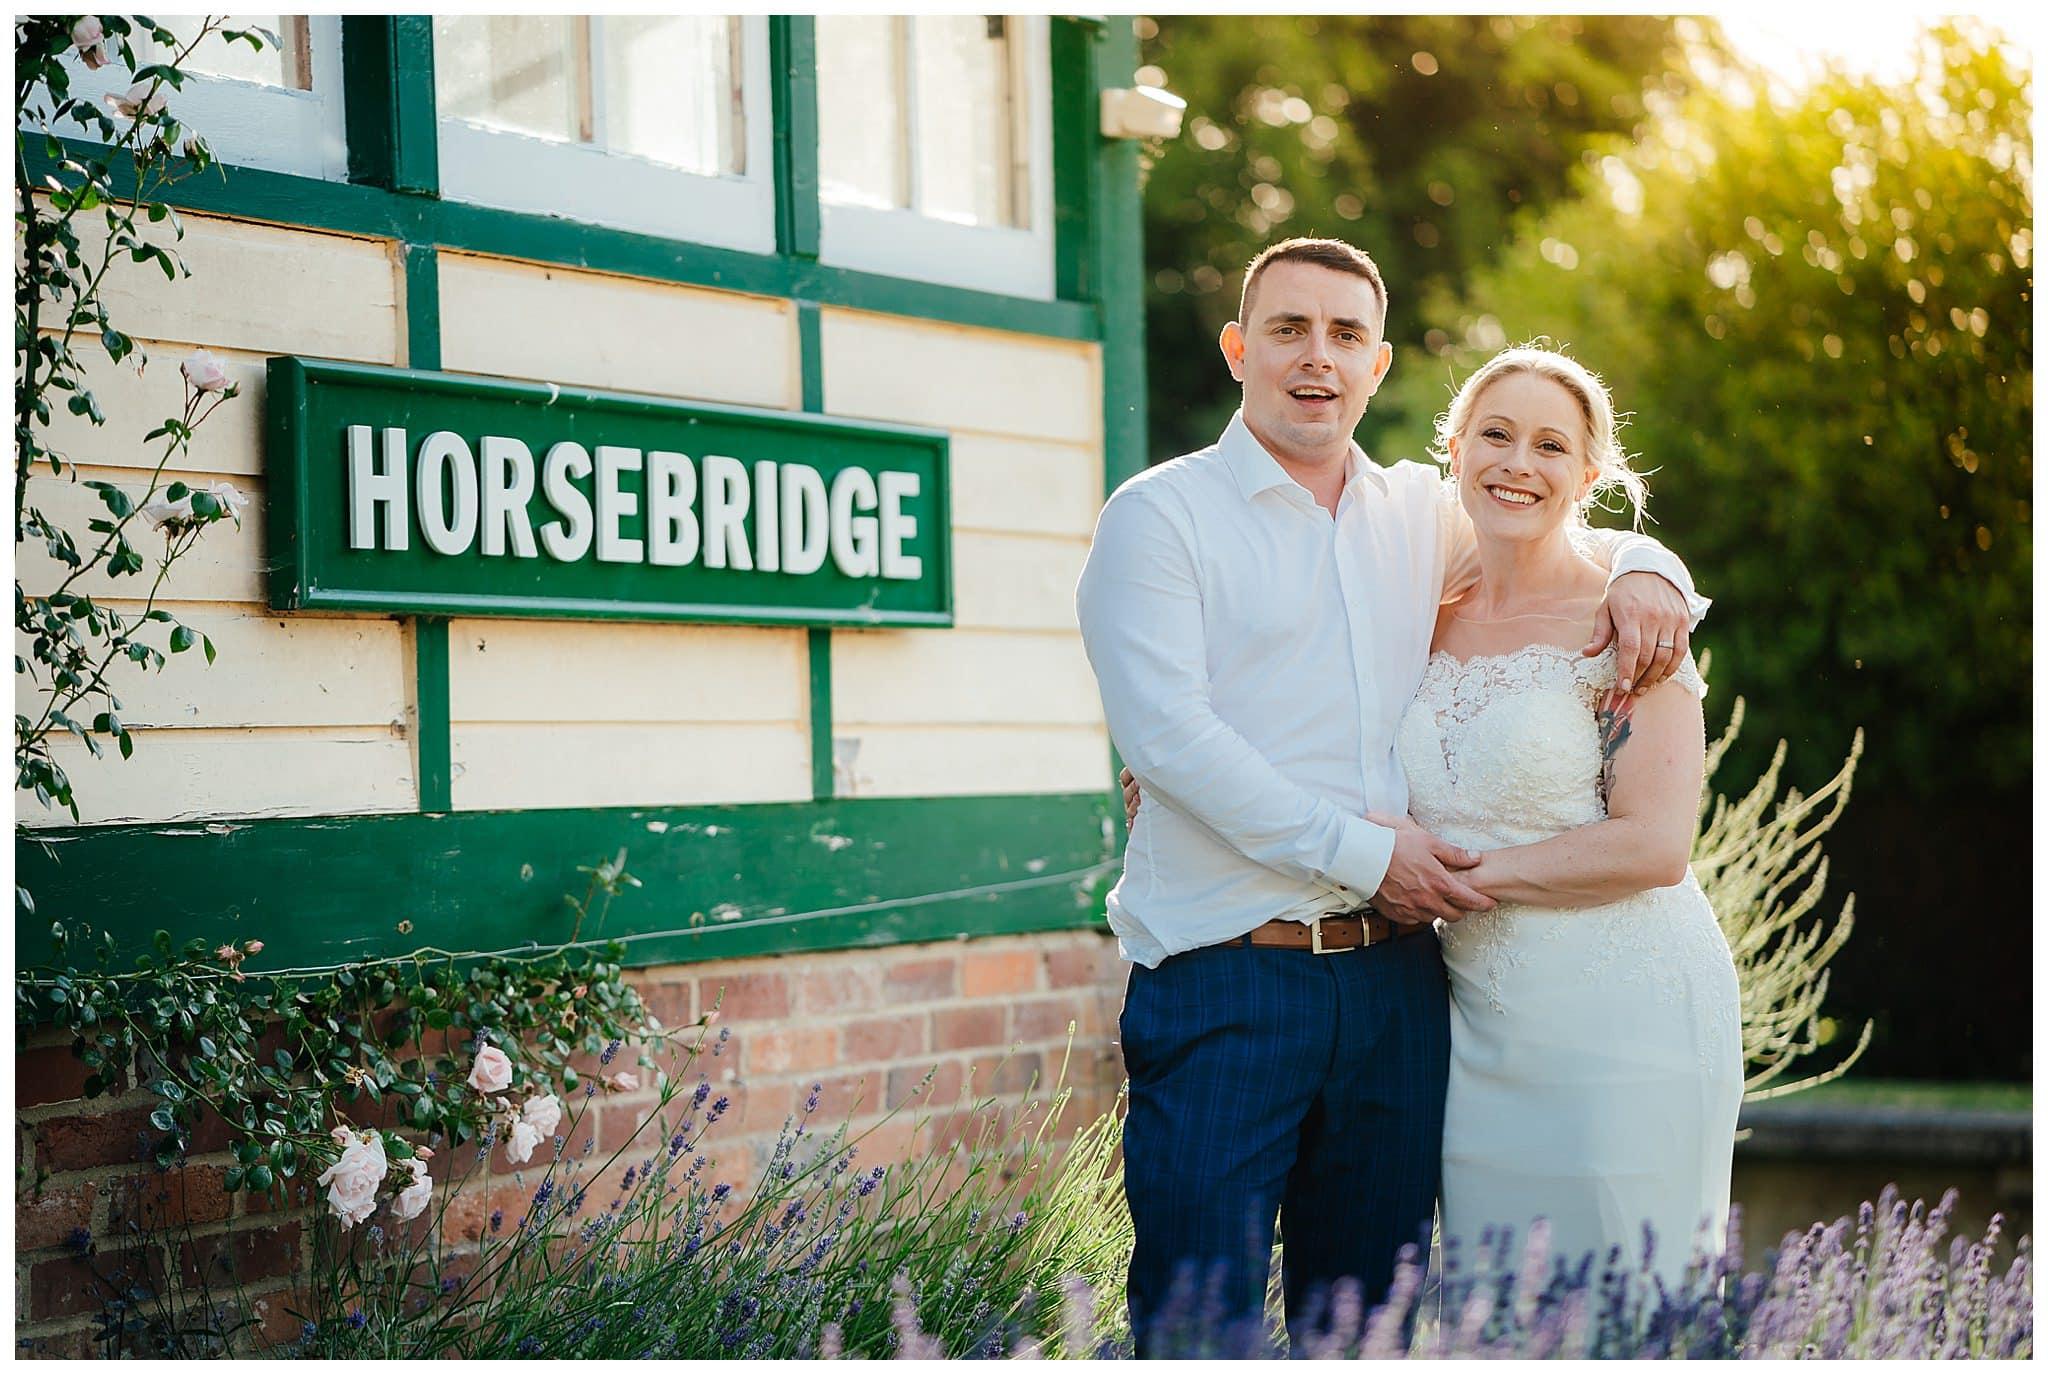 horsebridge station wedding photographer_0284